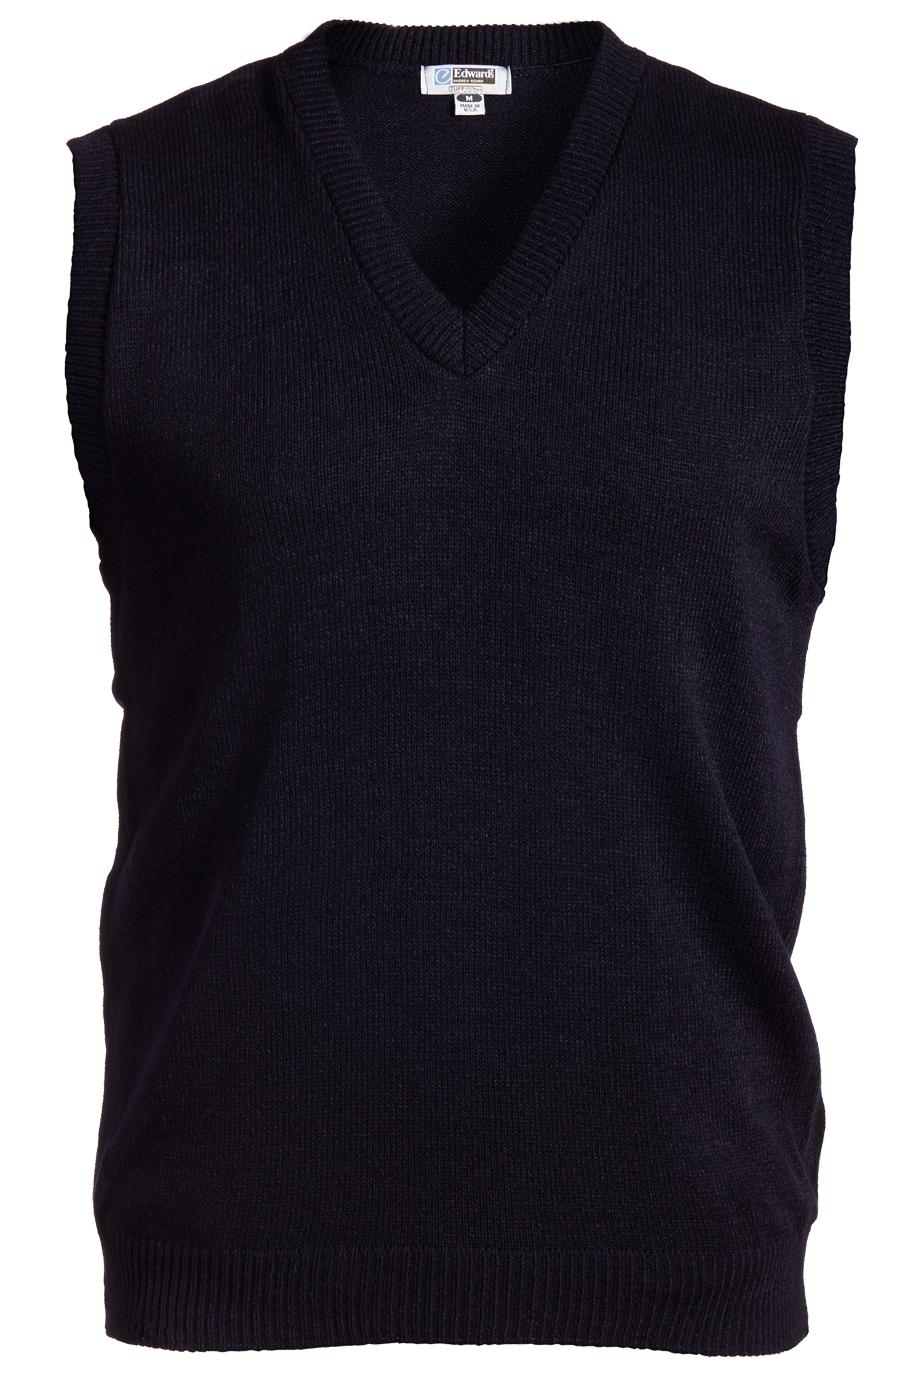 Edwards V-Neck Acrylic Sweater Vest-Edwards